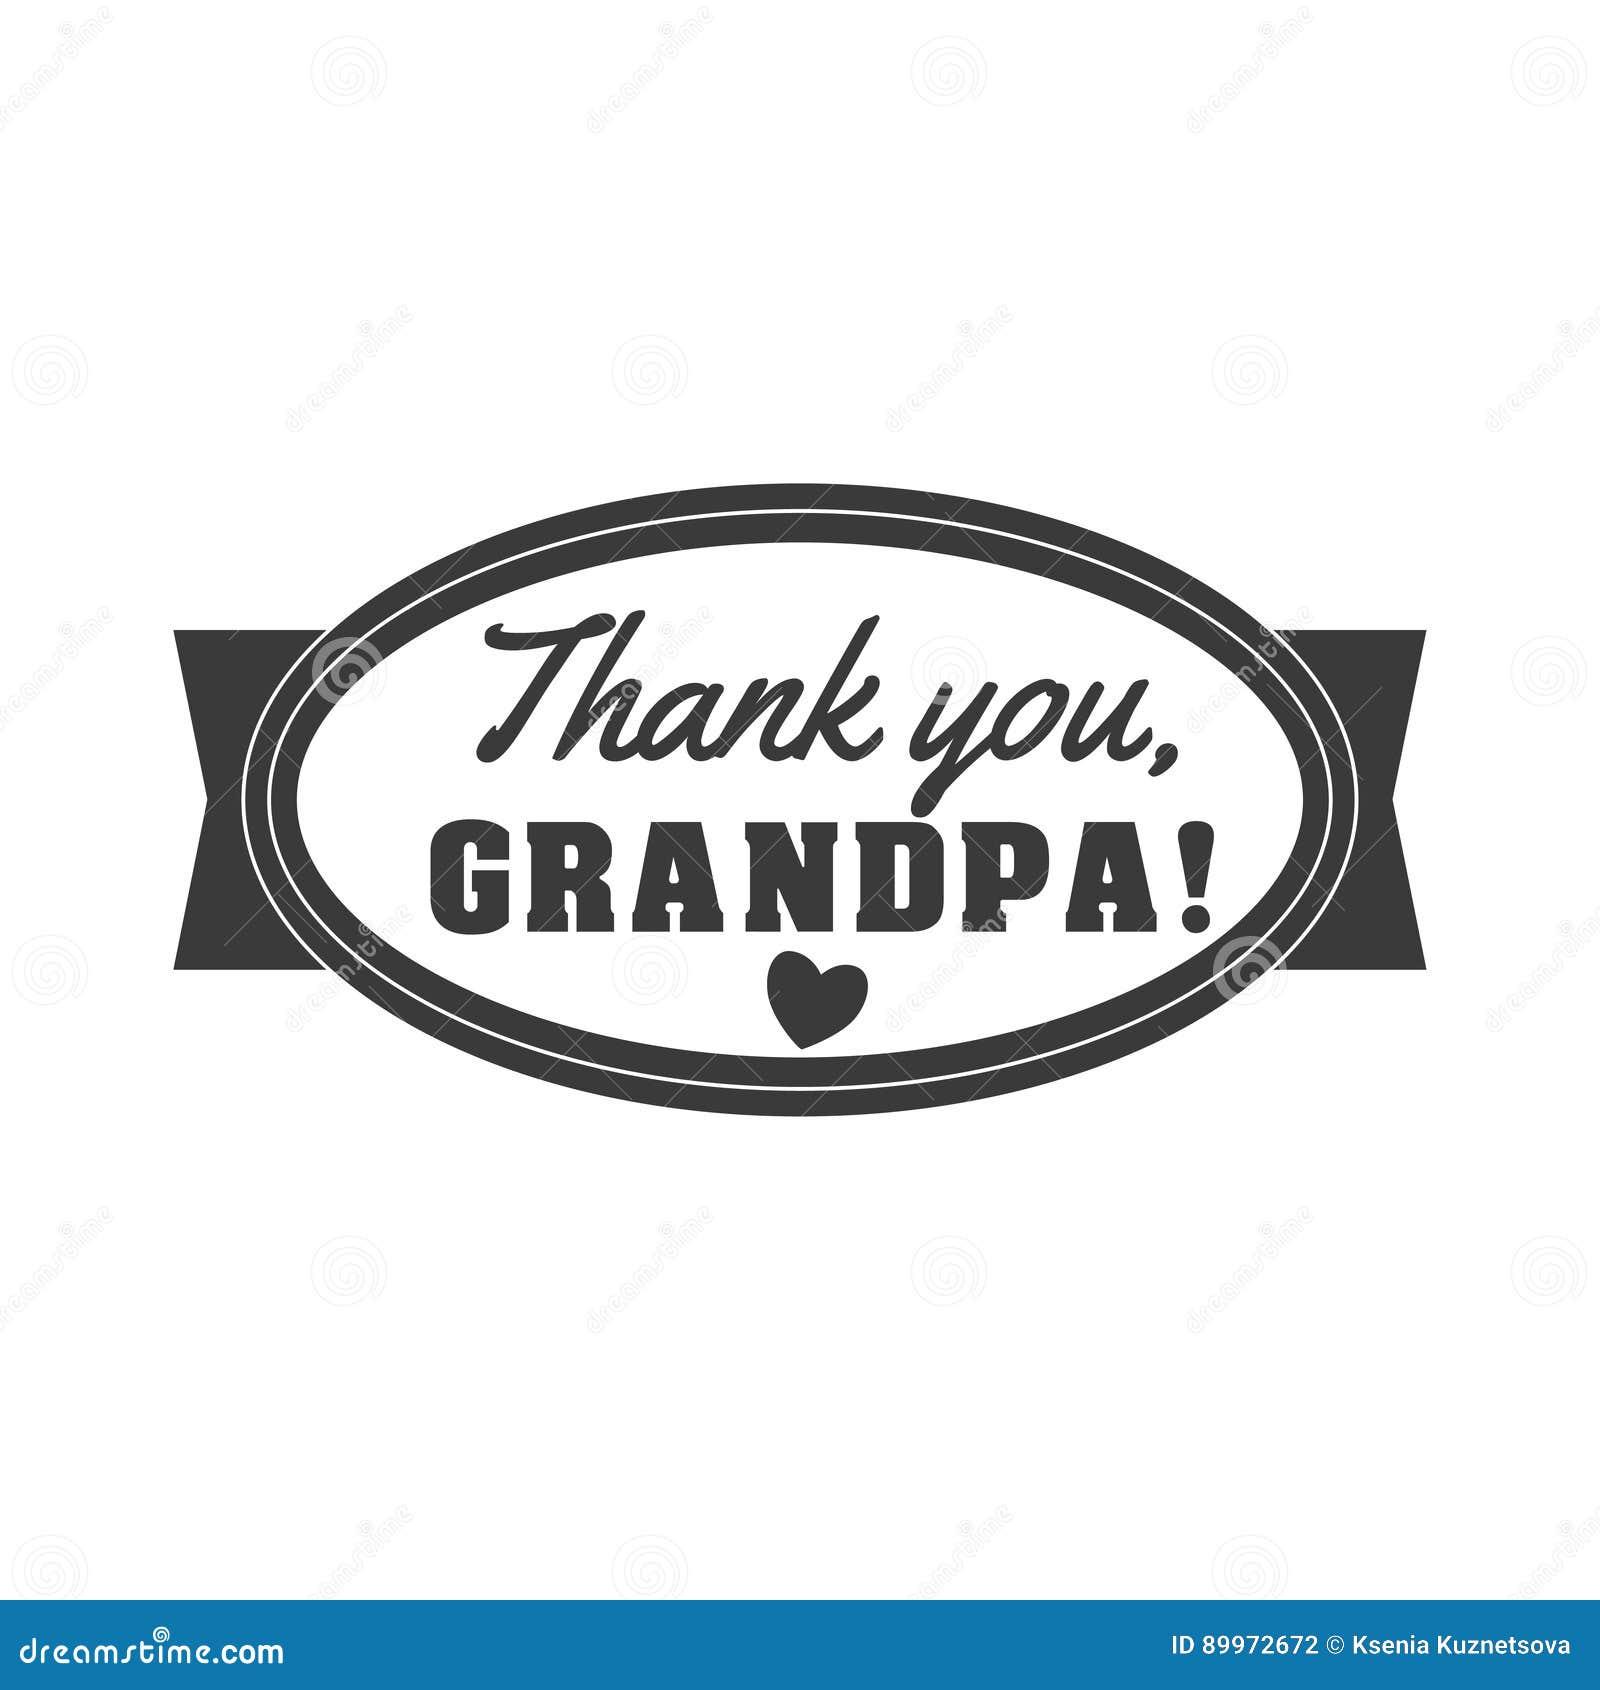 Vektorschwarzweiss Opa Zeichenillustration Danke Großvater